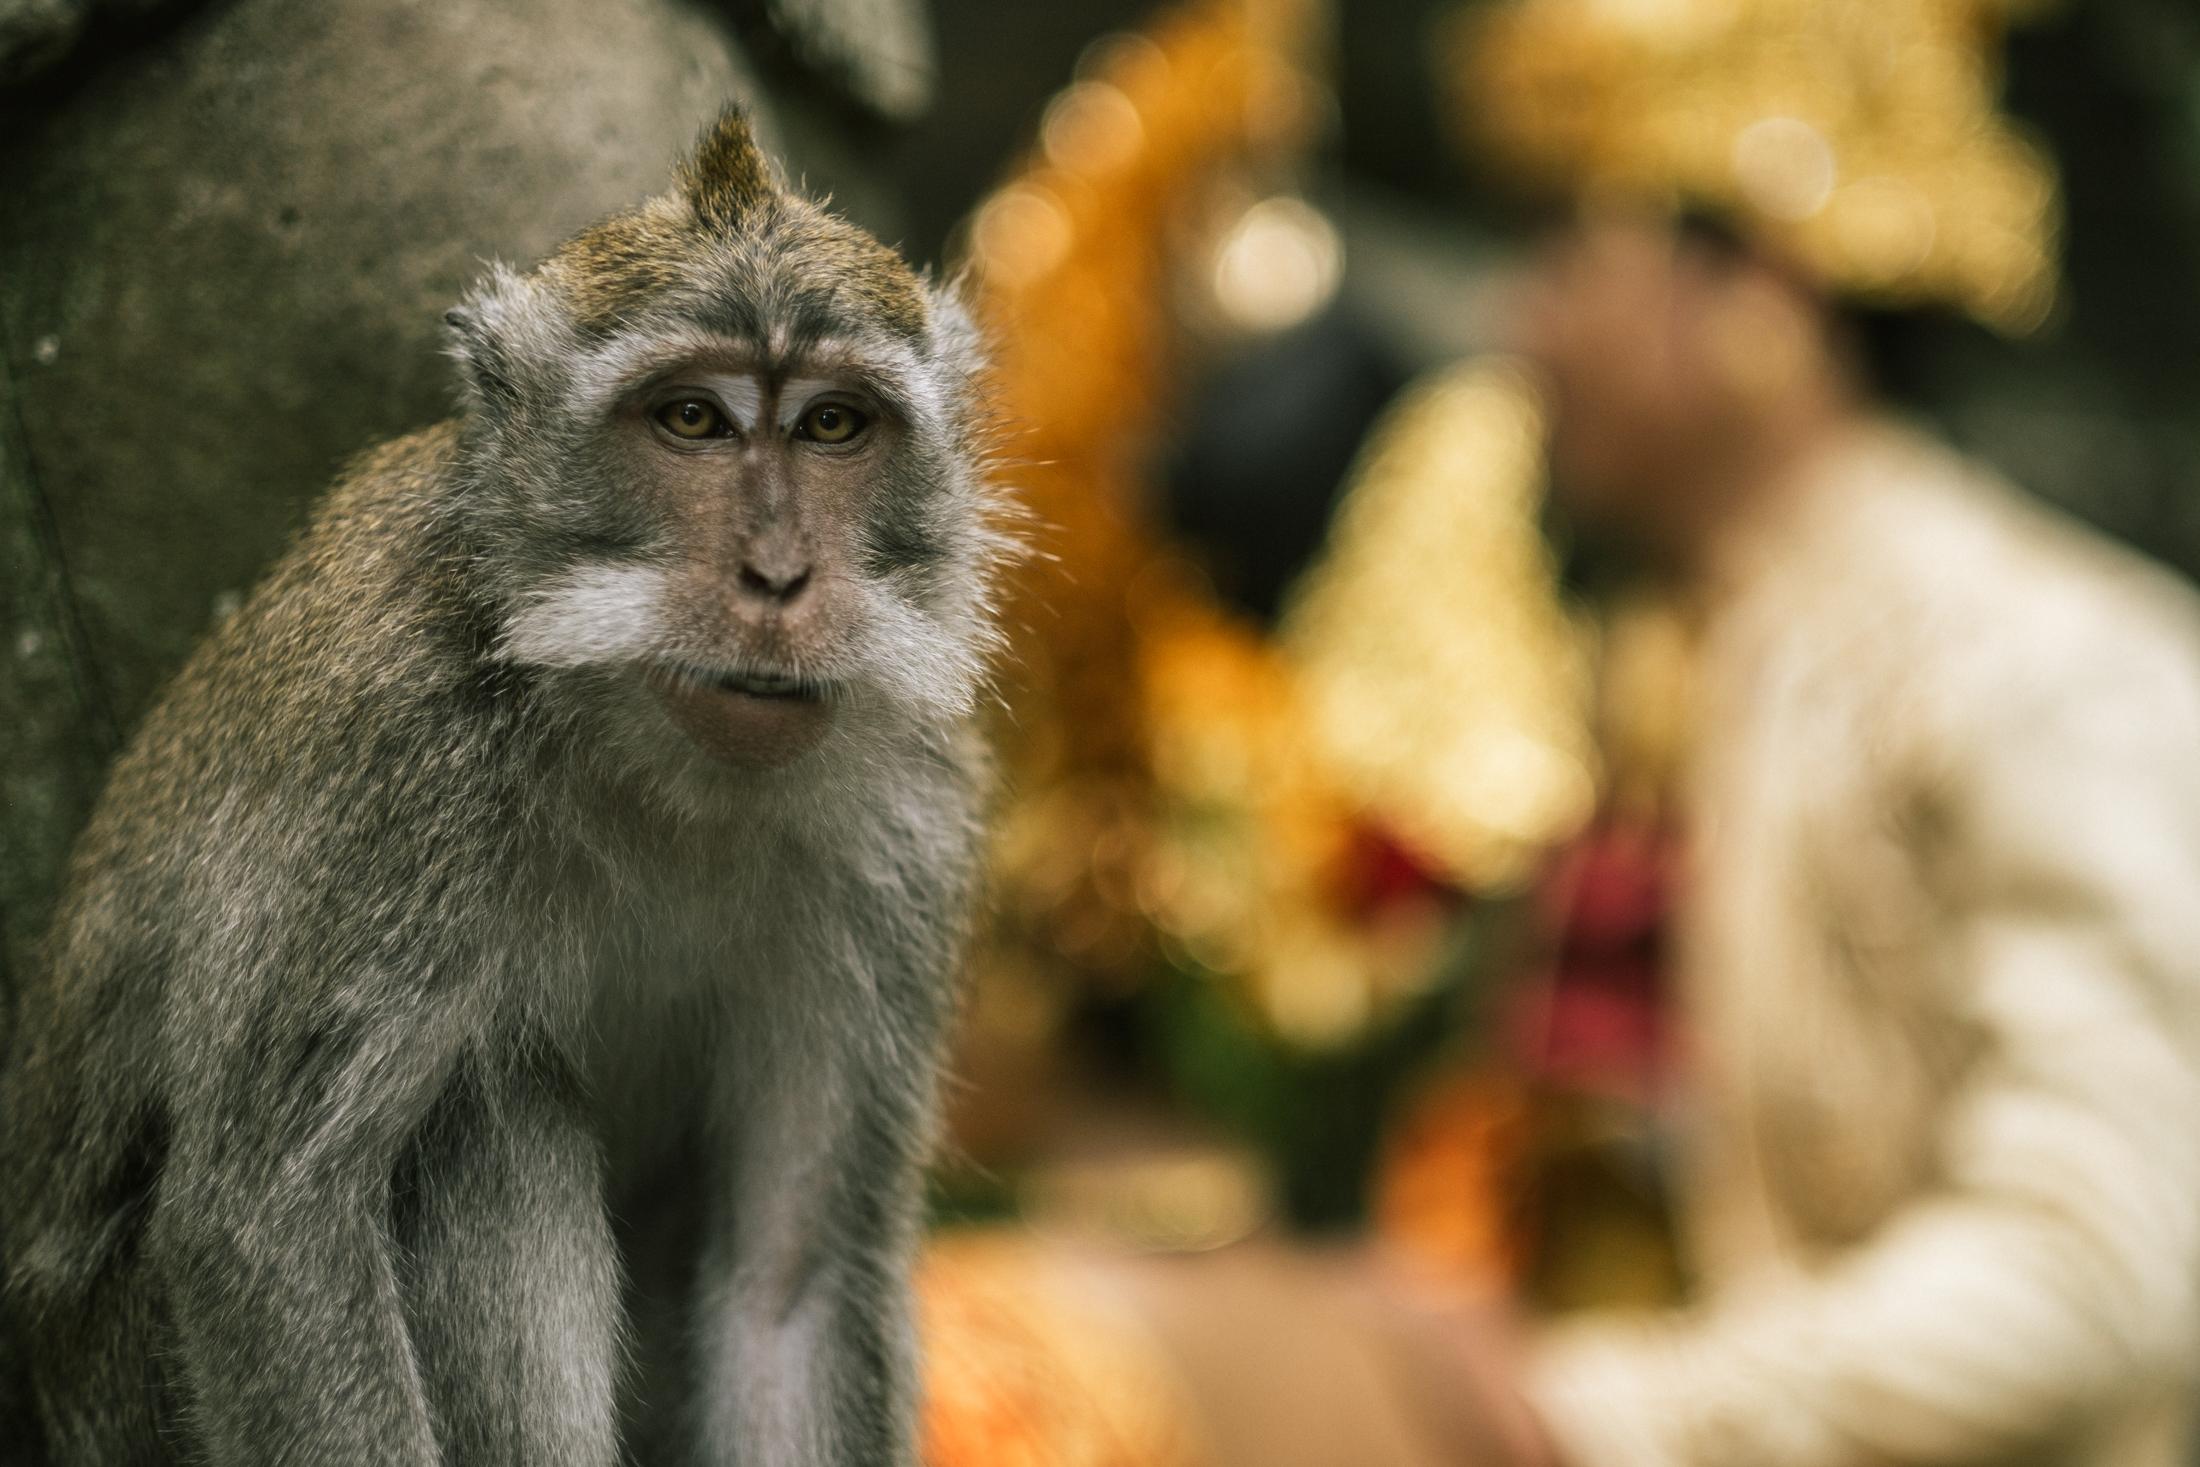 bali_day9_monkey-1.jpg